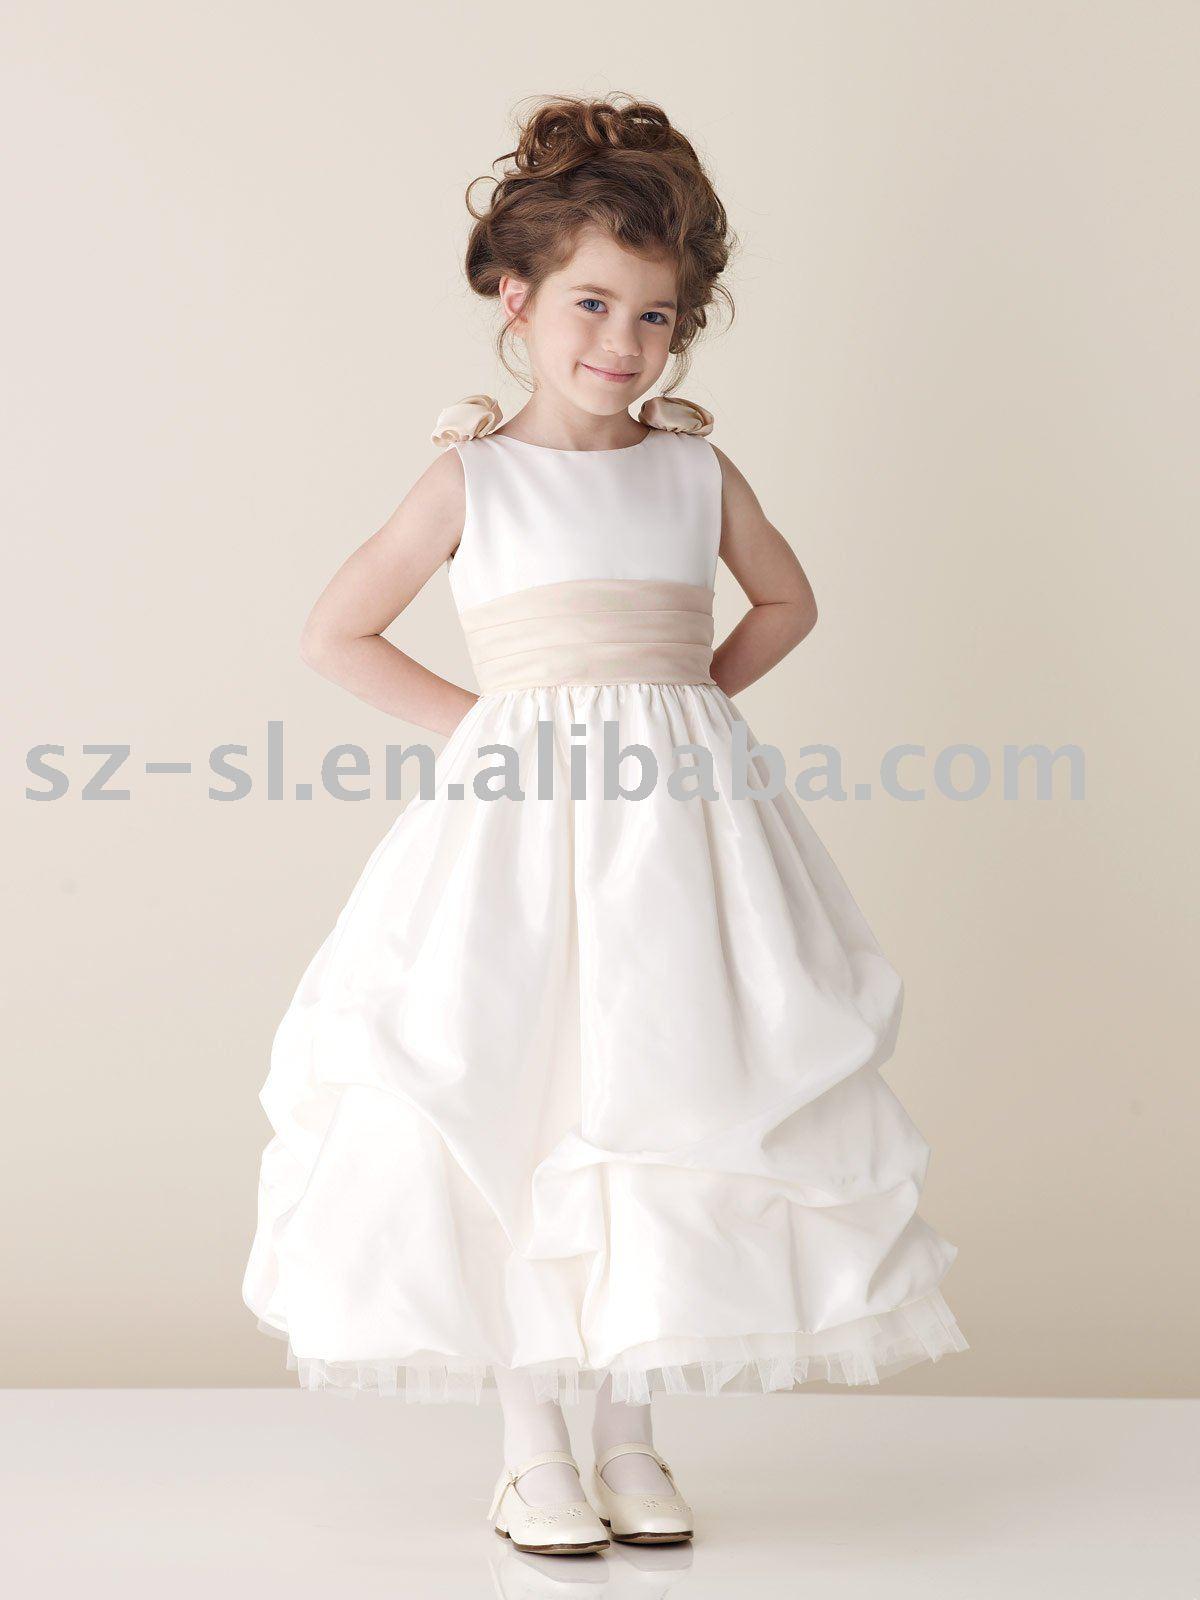 girls dresses seattle wedding wedding dresses for girls Girls Dresses Seattle Wedding